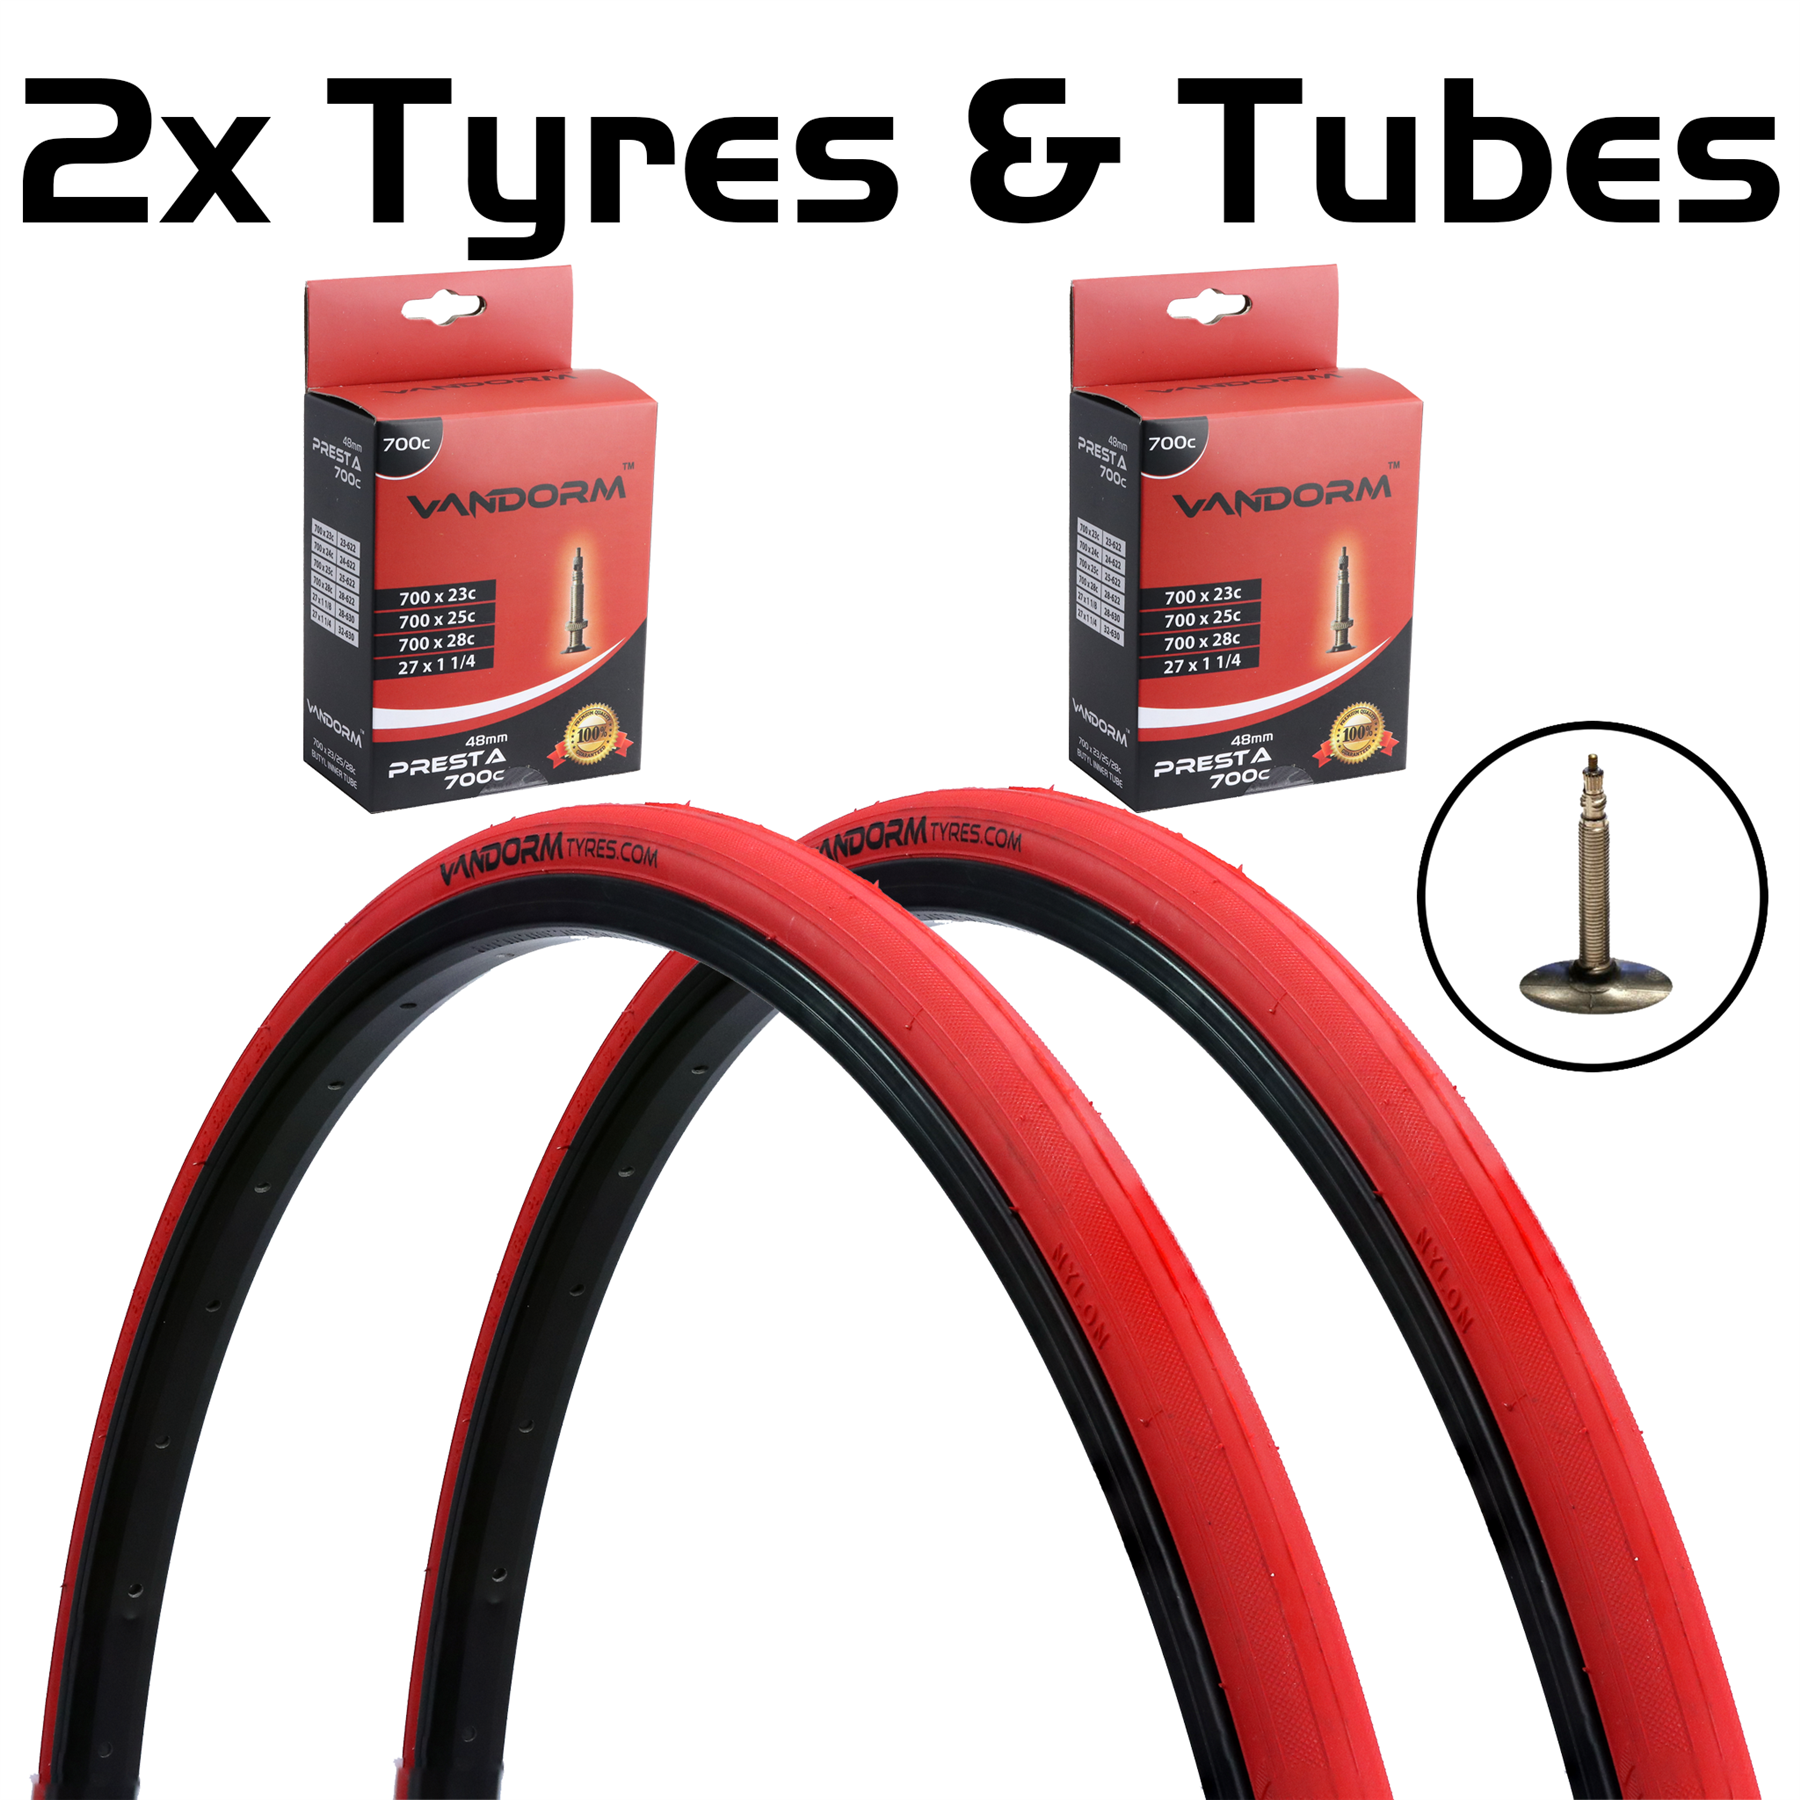 miniatuur 10 - Vandorm 700 x 23c SPEED 3 Colour Road Bike Fixie Tyres & Tube DEAL OPTIONS